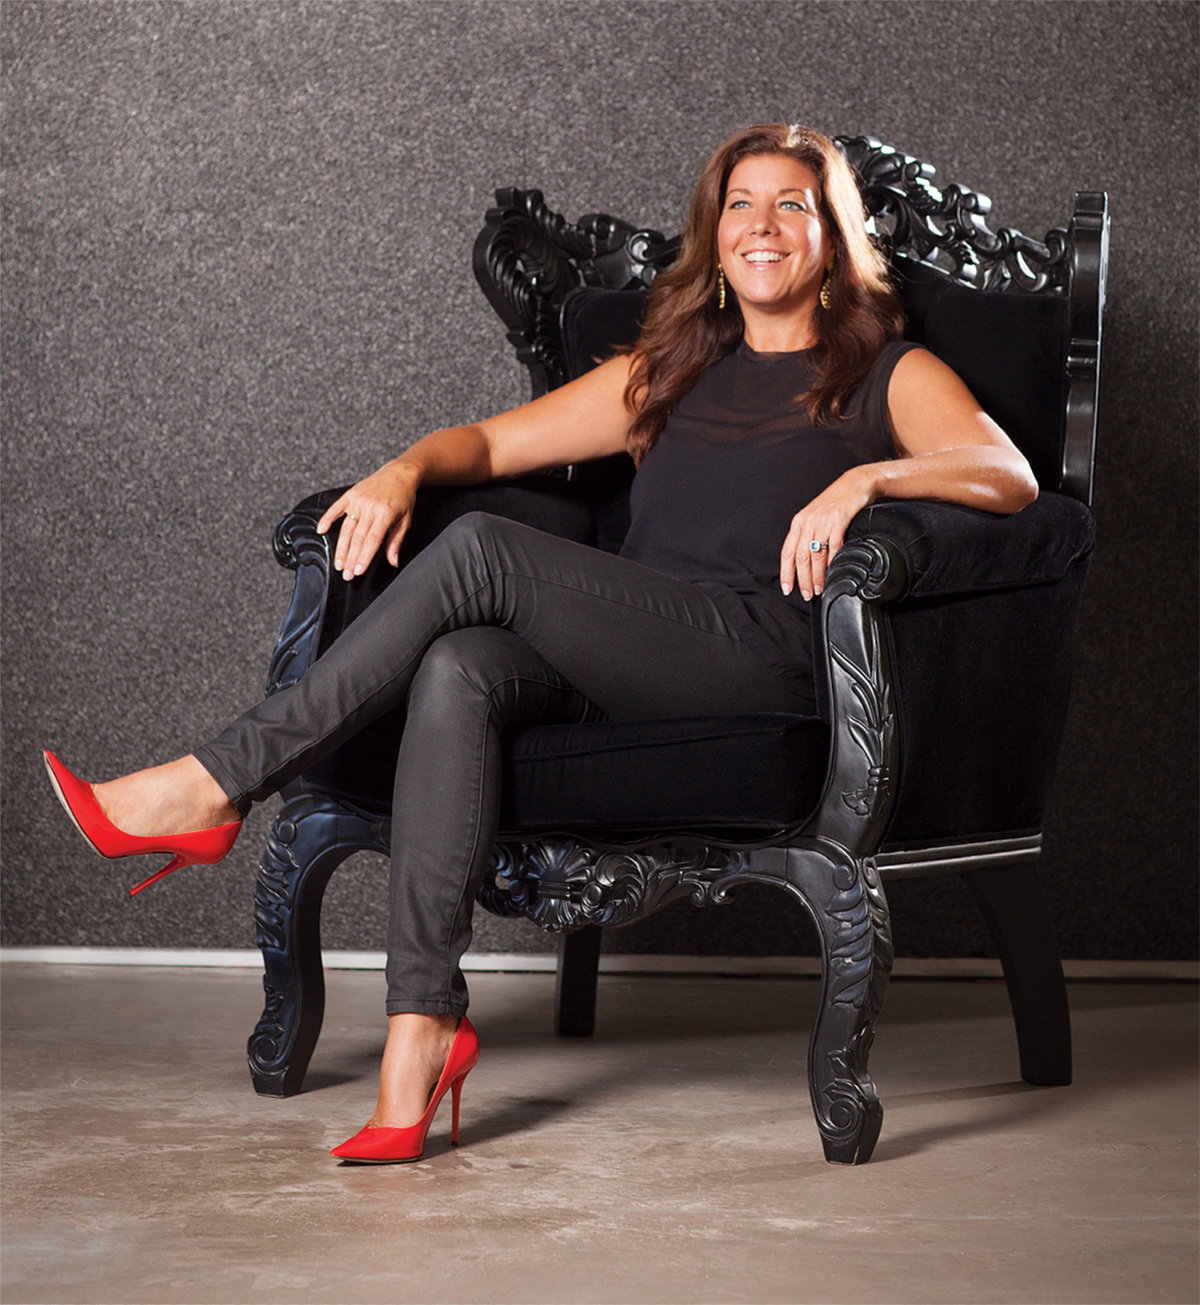 Branding Queen: Kristen Cavallo's Favorite Things